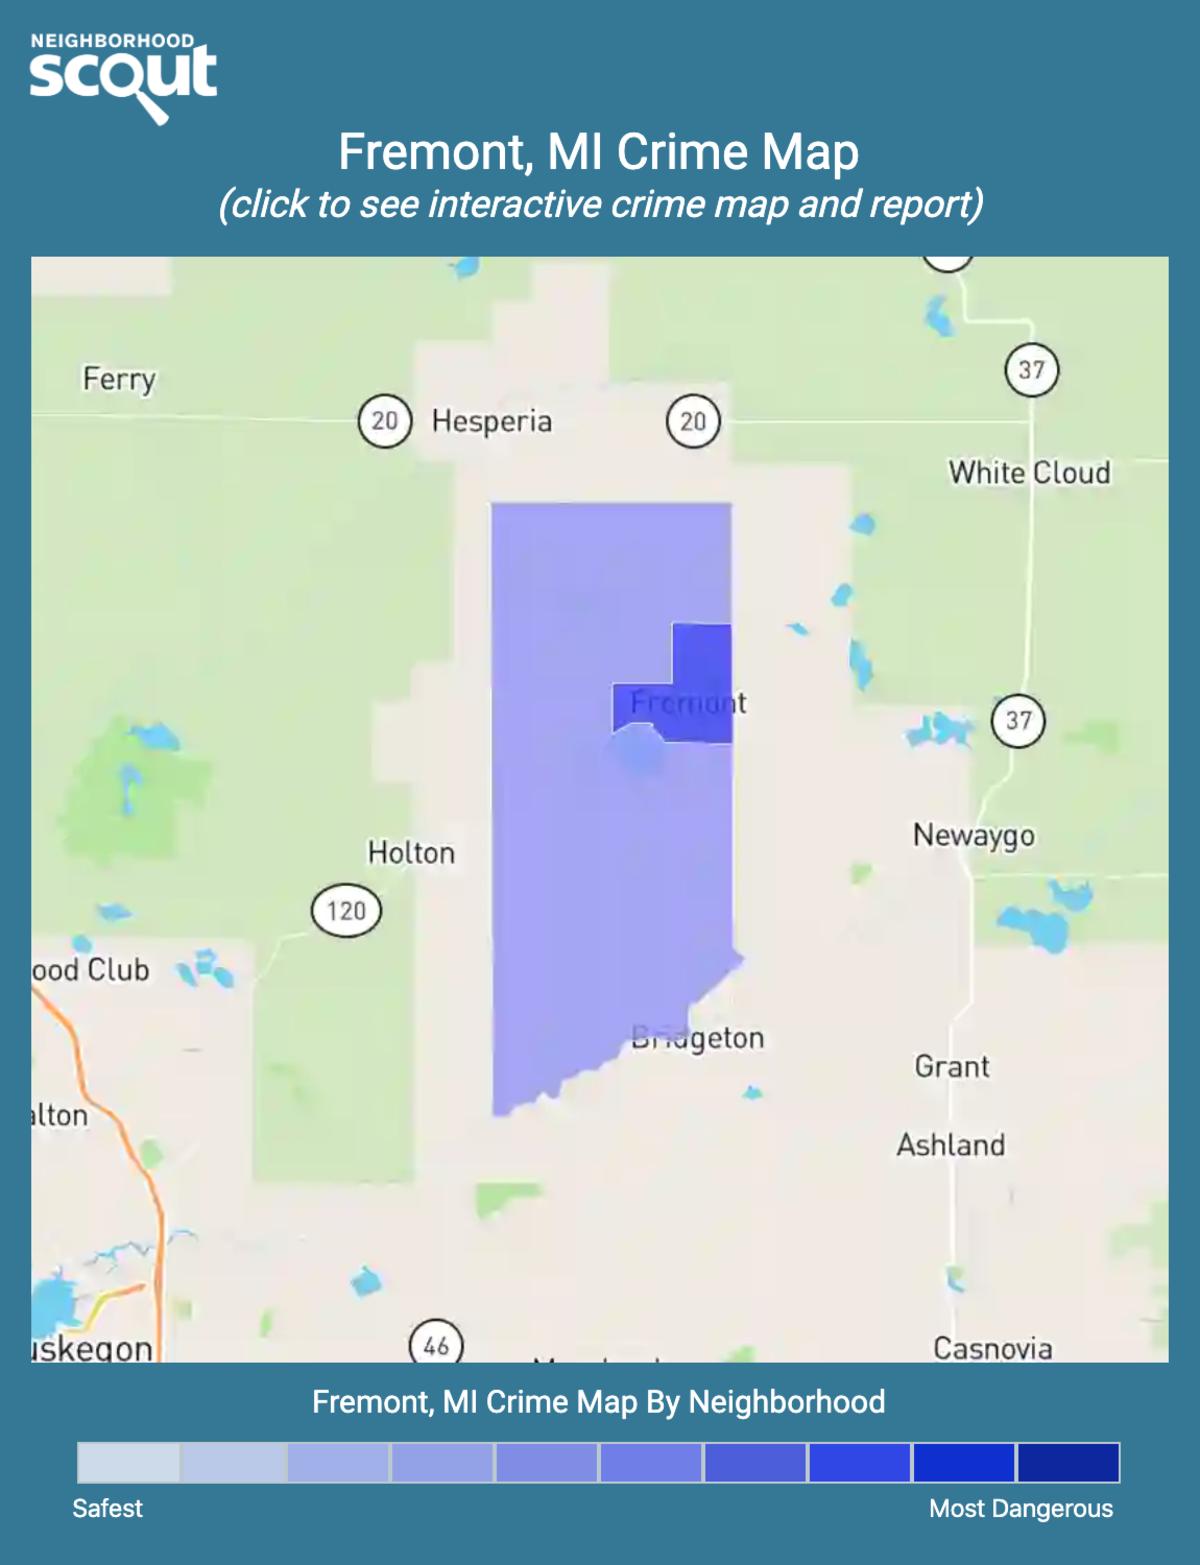 Fremont, Michigan crime map